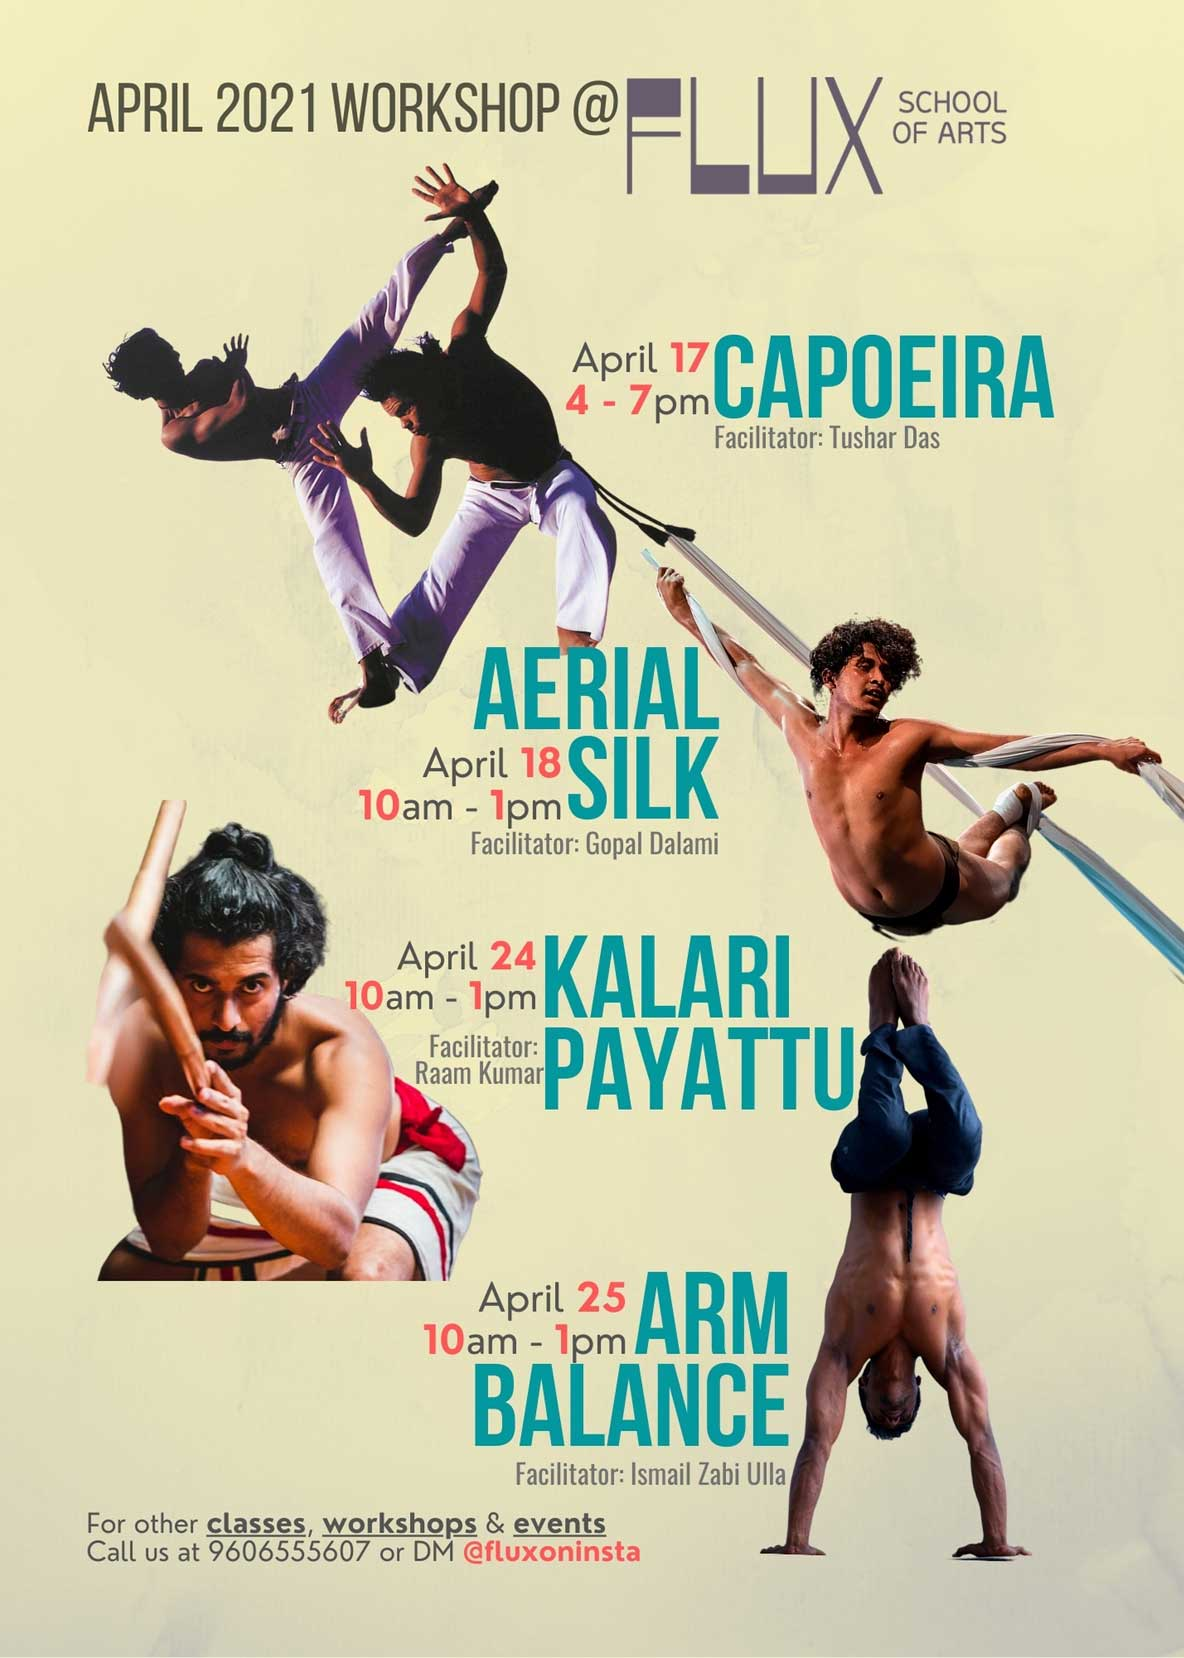 Body Movement Workshops in Bangalore Indira-at-FLUX: Capoeira, Aerial Silks, Kalaripayattu & Arm Balance